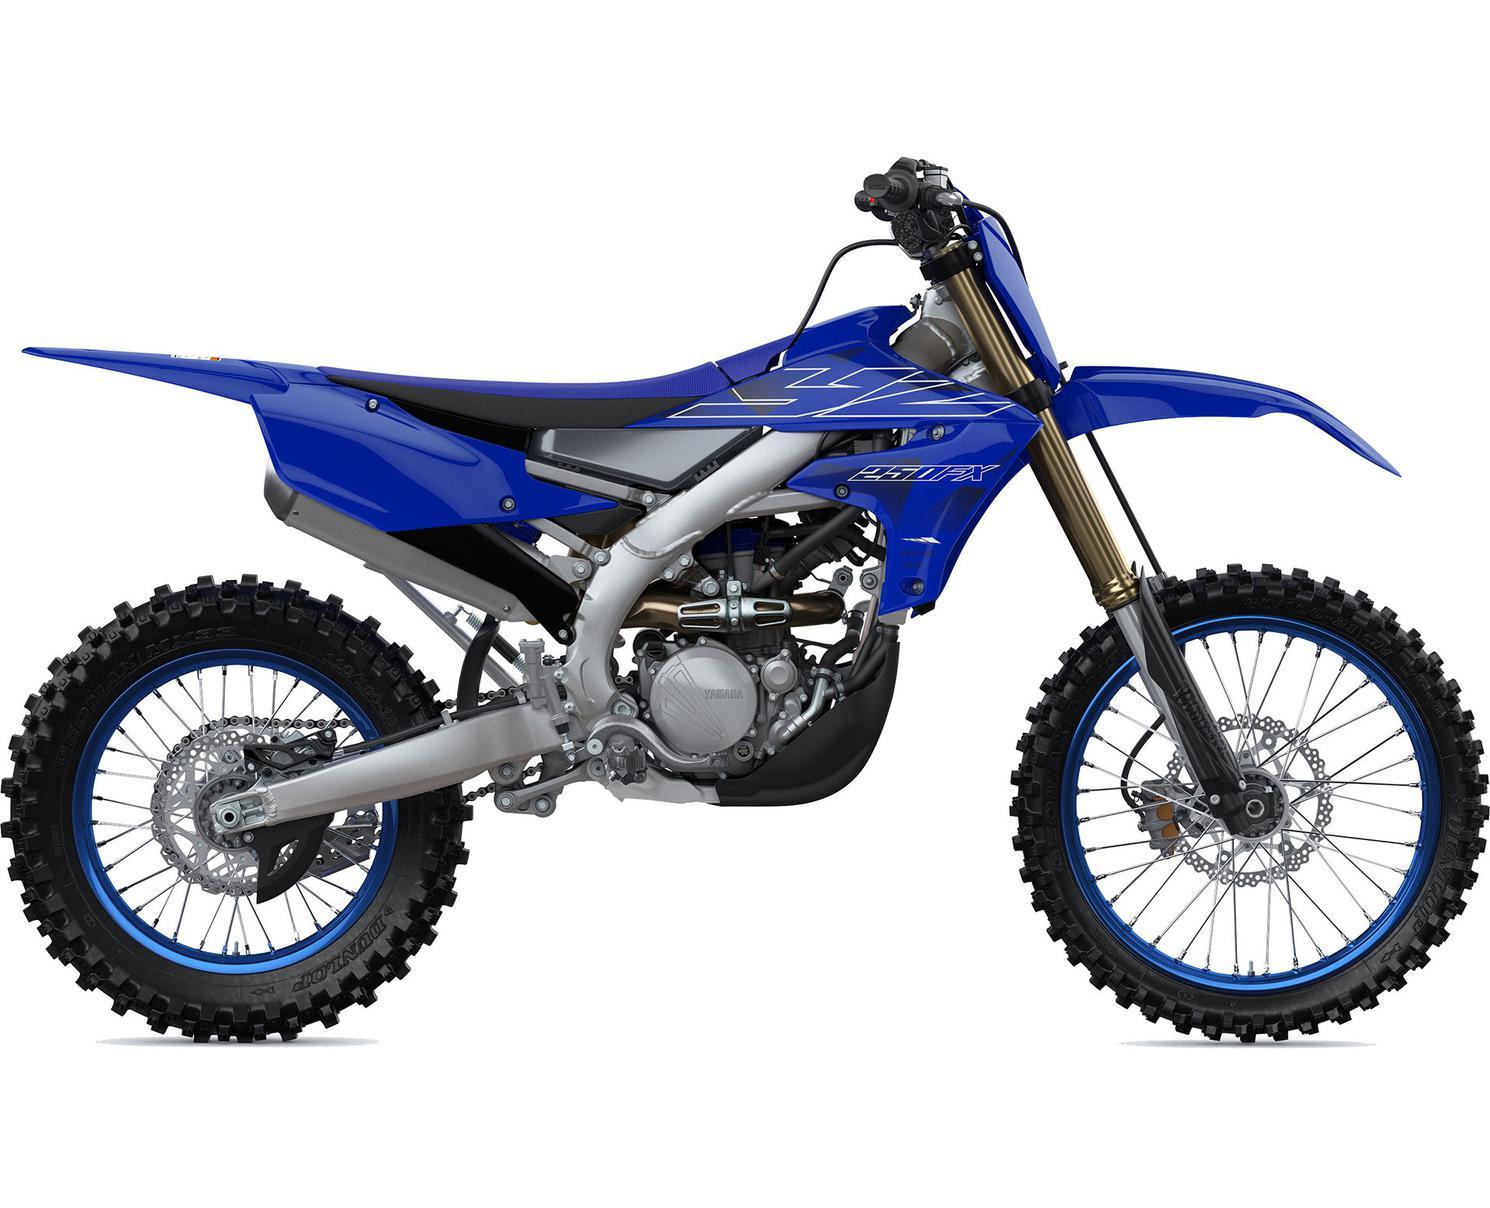 2022 Yamaha YZ250FX Team Yamaha Blue